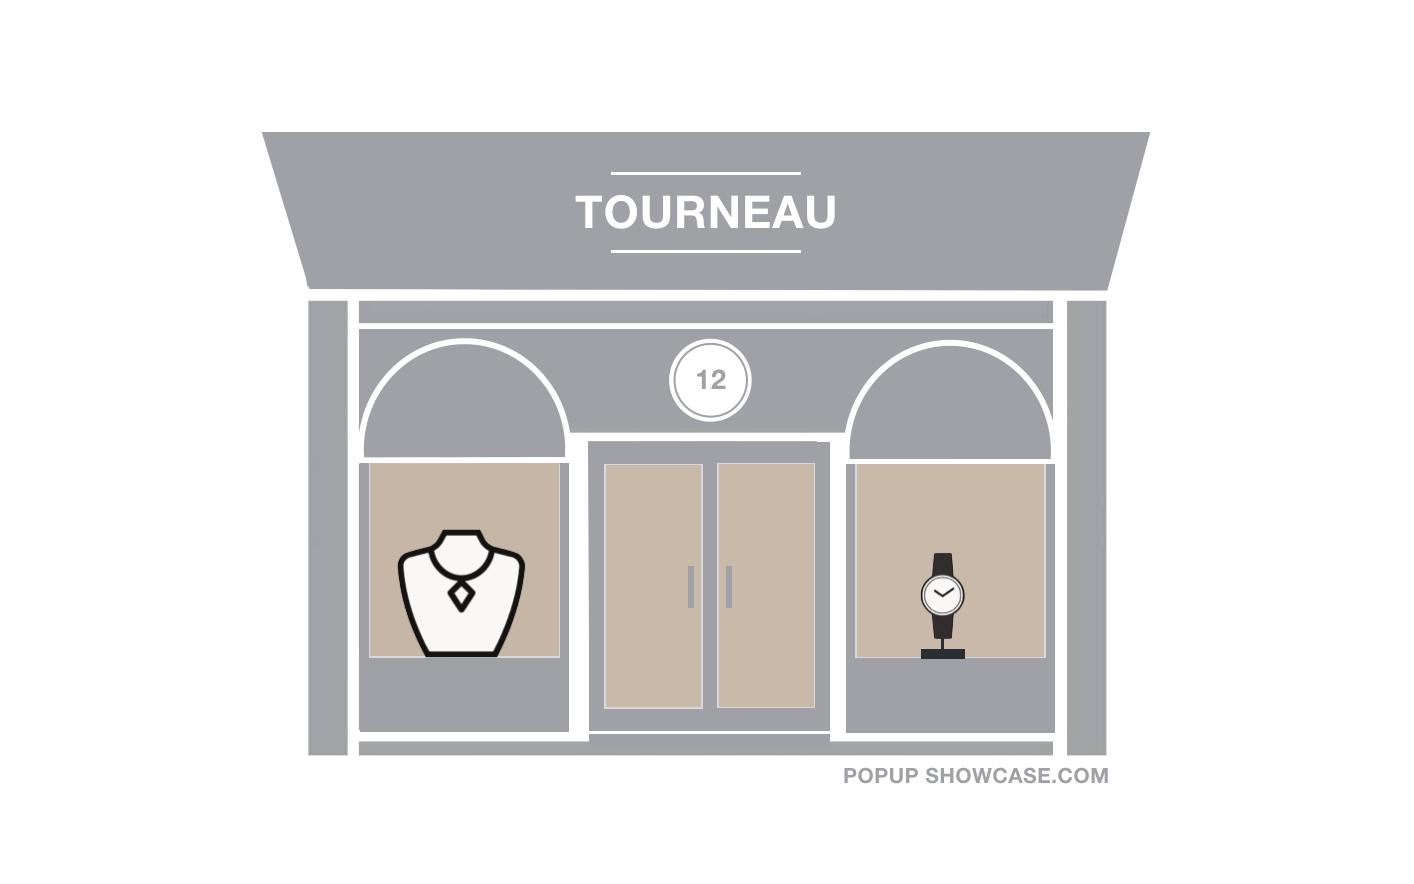 Tourneau, TimeMachine | Pop Up Showcase